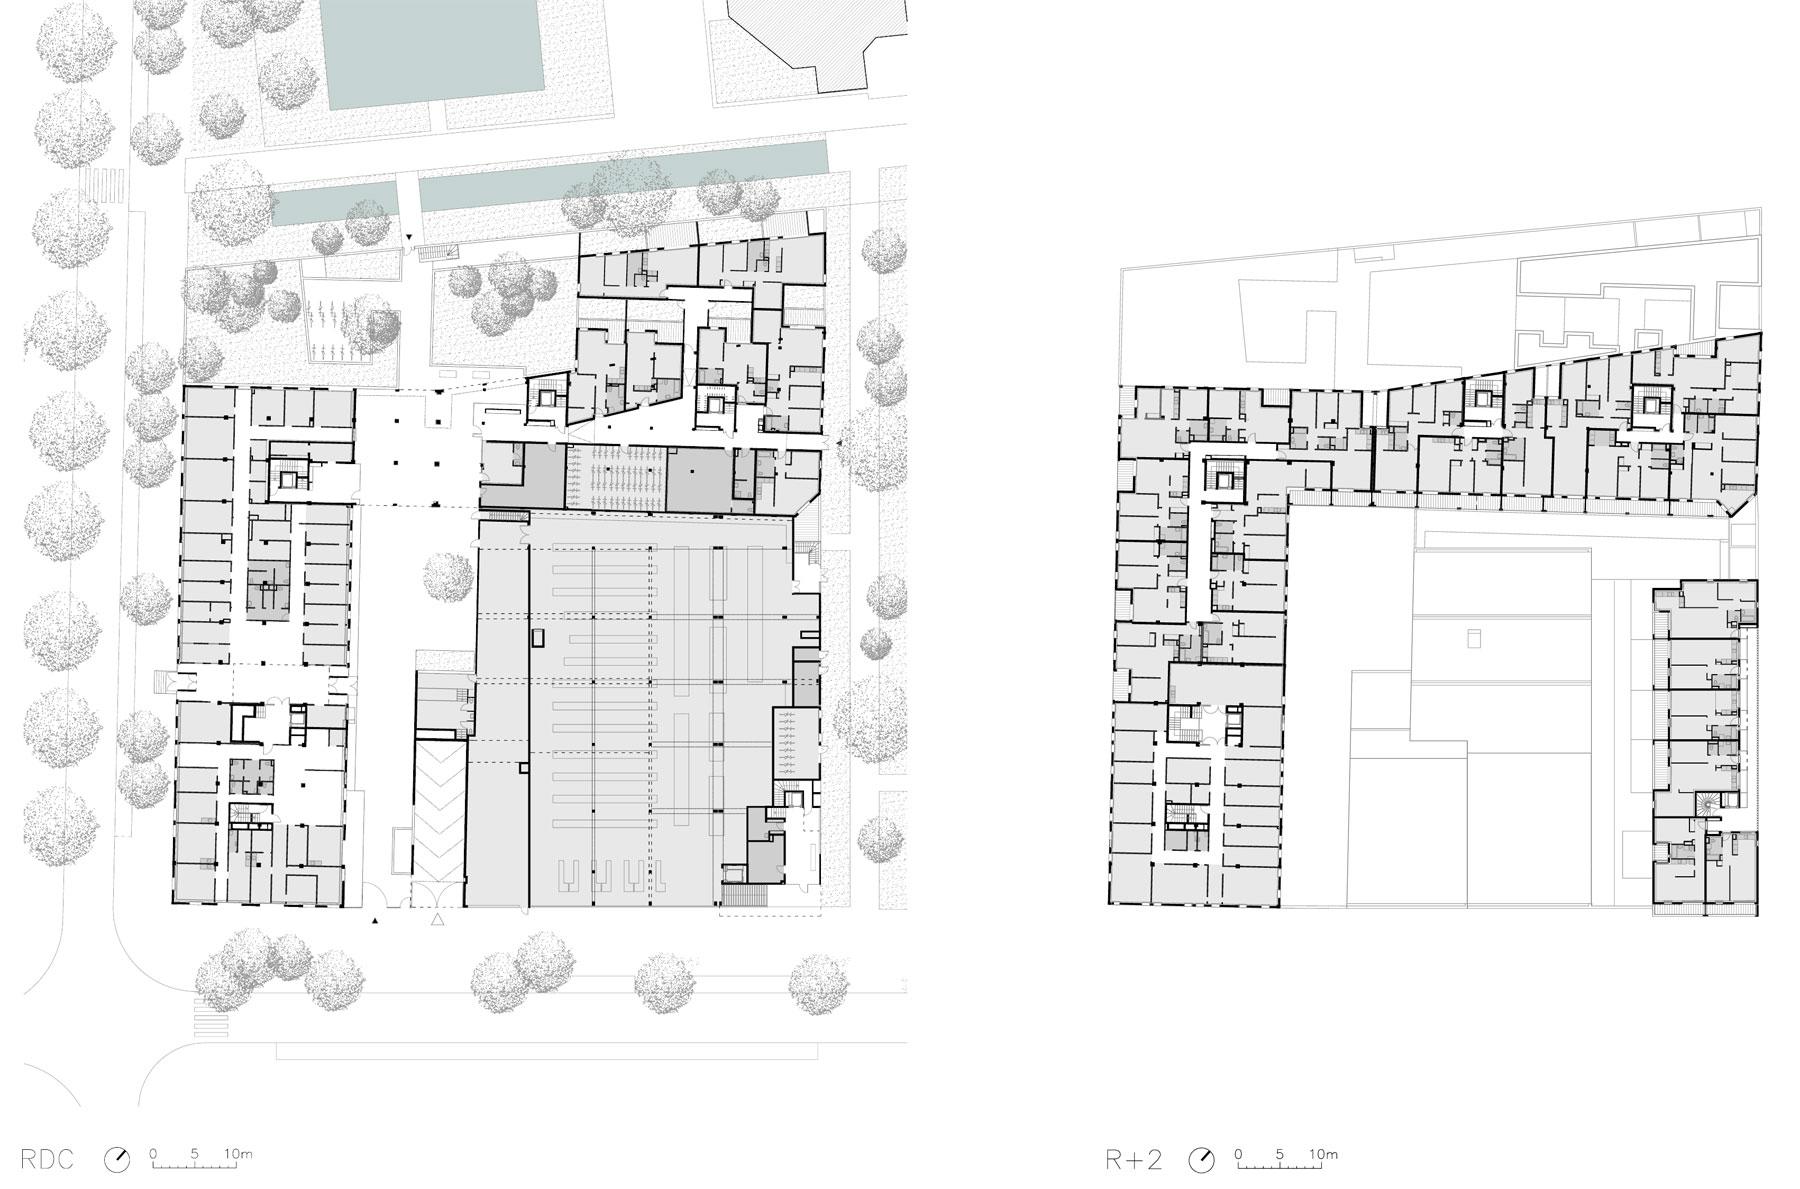 4-jam-SO2-bretigny-logements-bureaux-supermarche-plan-rdc-r+2